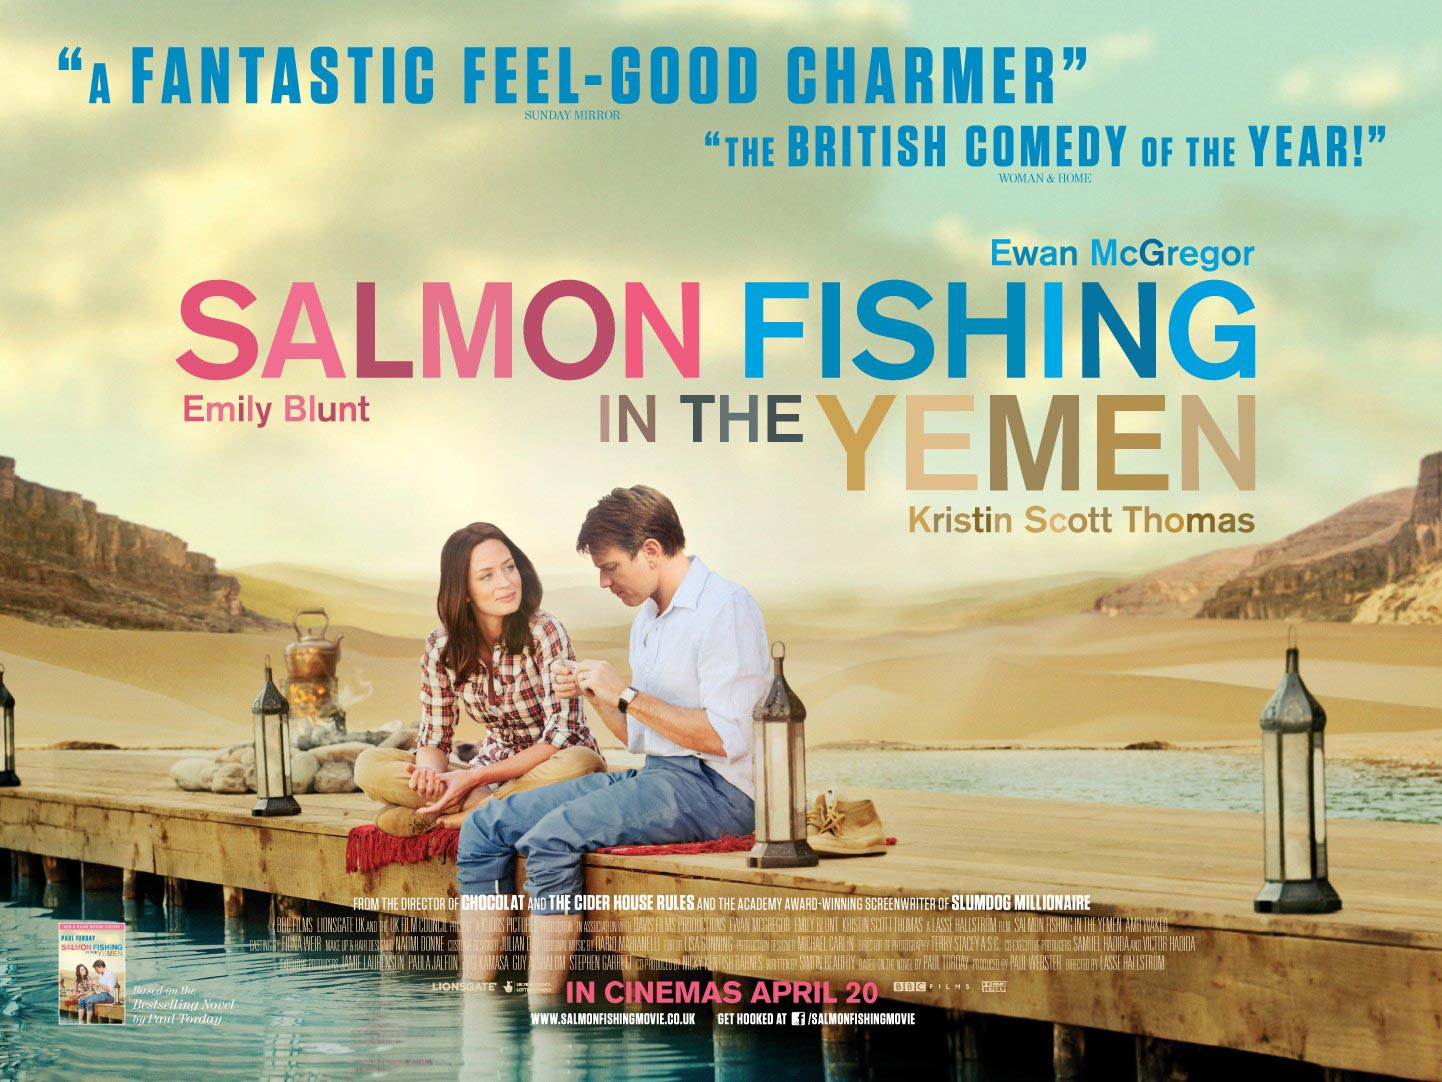 http://3.bp.blogspot.com/-CYfSydrchgs/T1ljwM0qHZI/AAAAAAAARQE/vAPKuDVVR0o/s1600/salmon-fishing-yemen-poster01.jpg